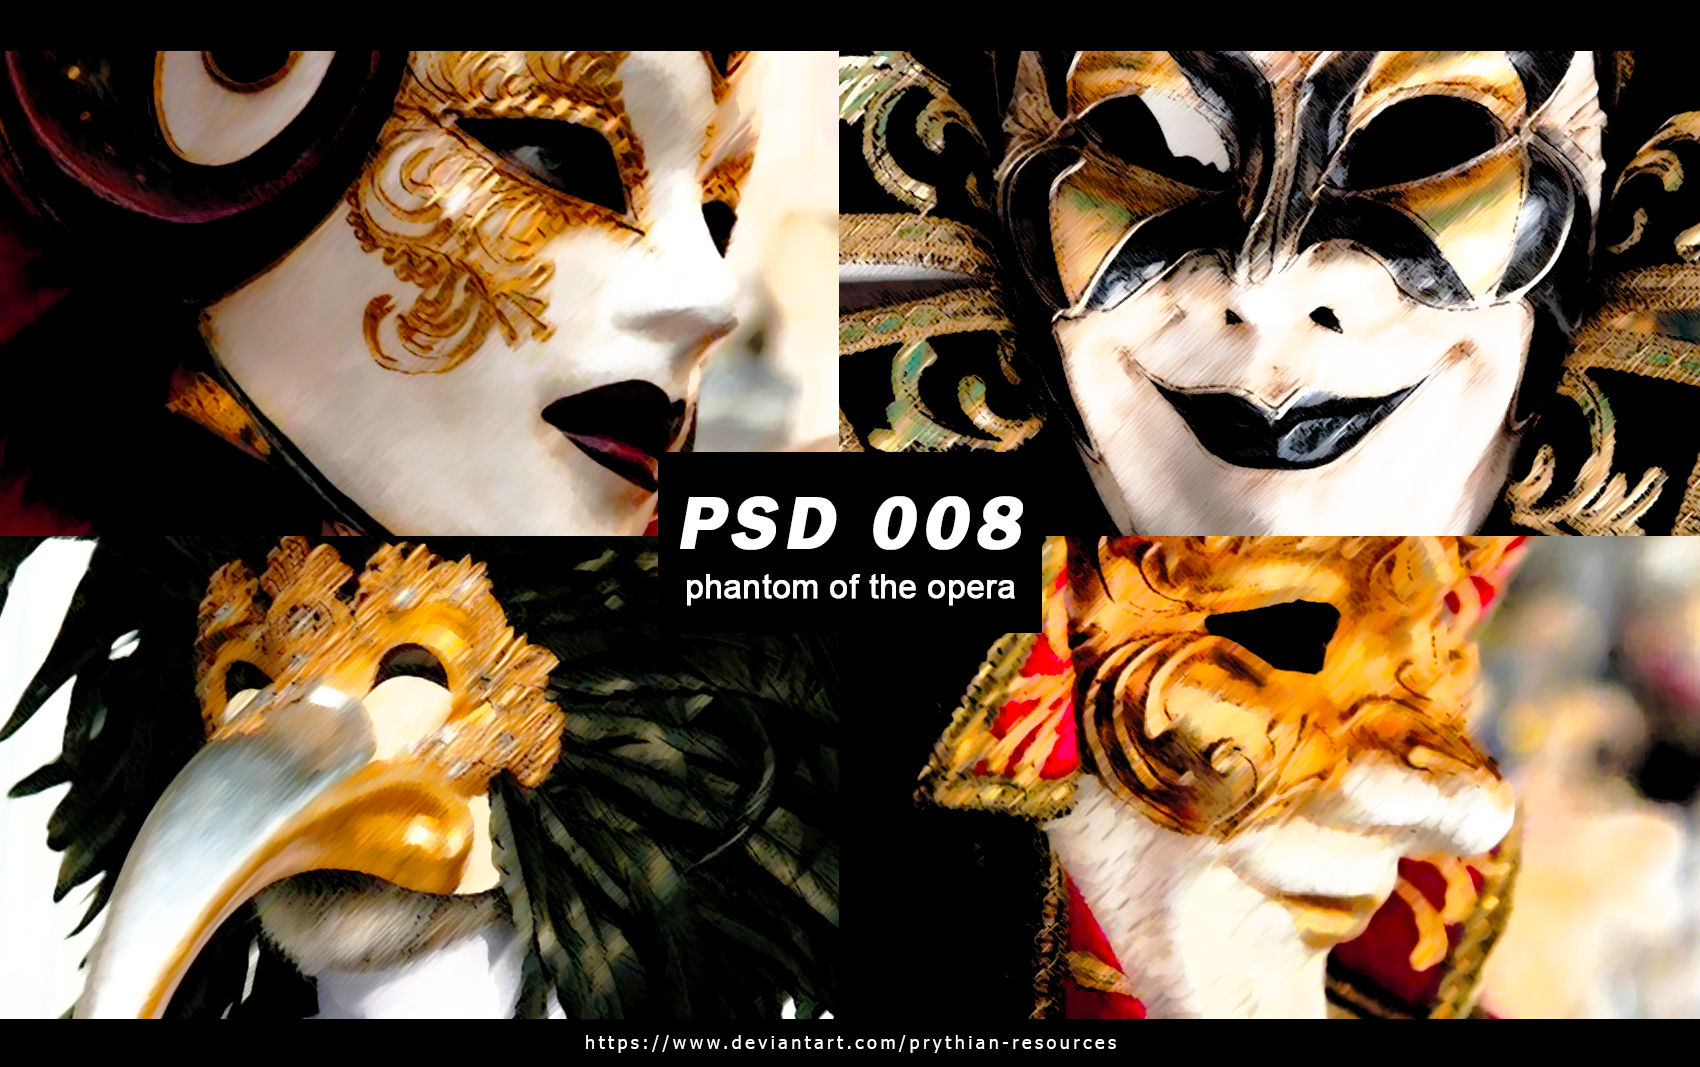 PHANTOM OF THE OPERA ||PSD 008